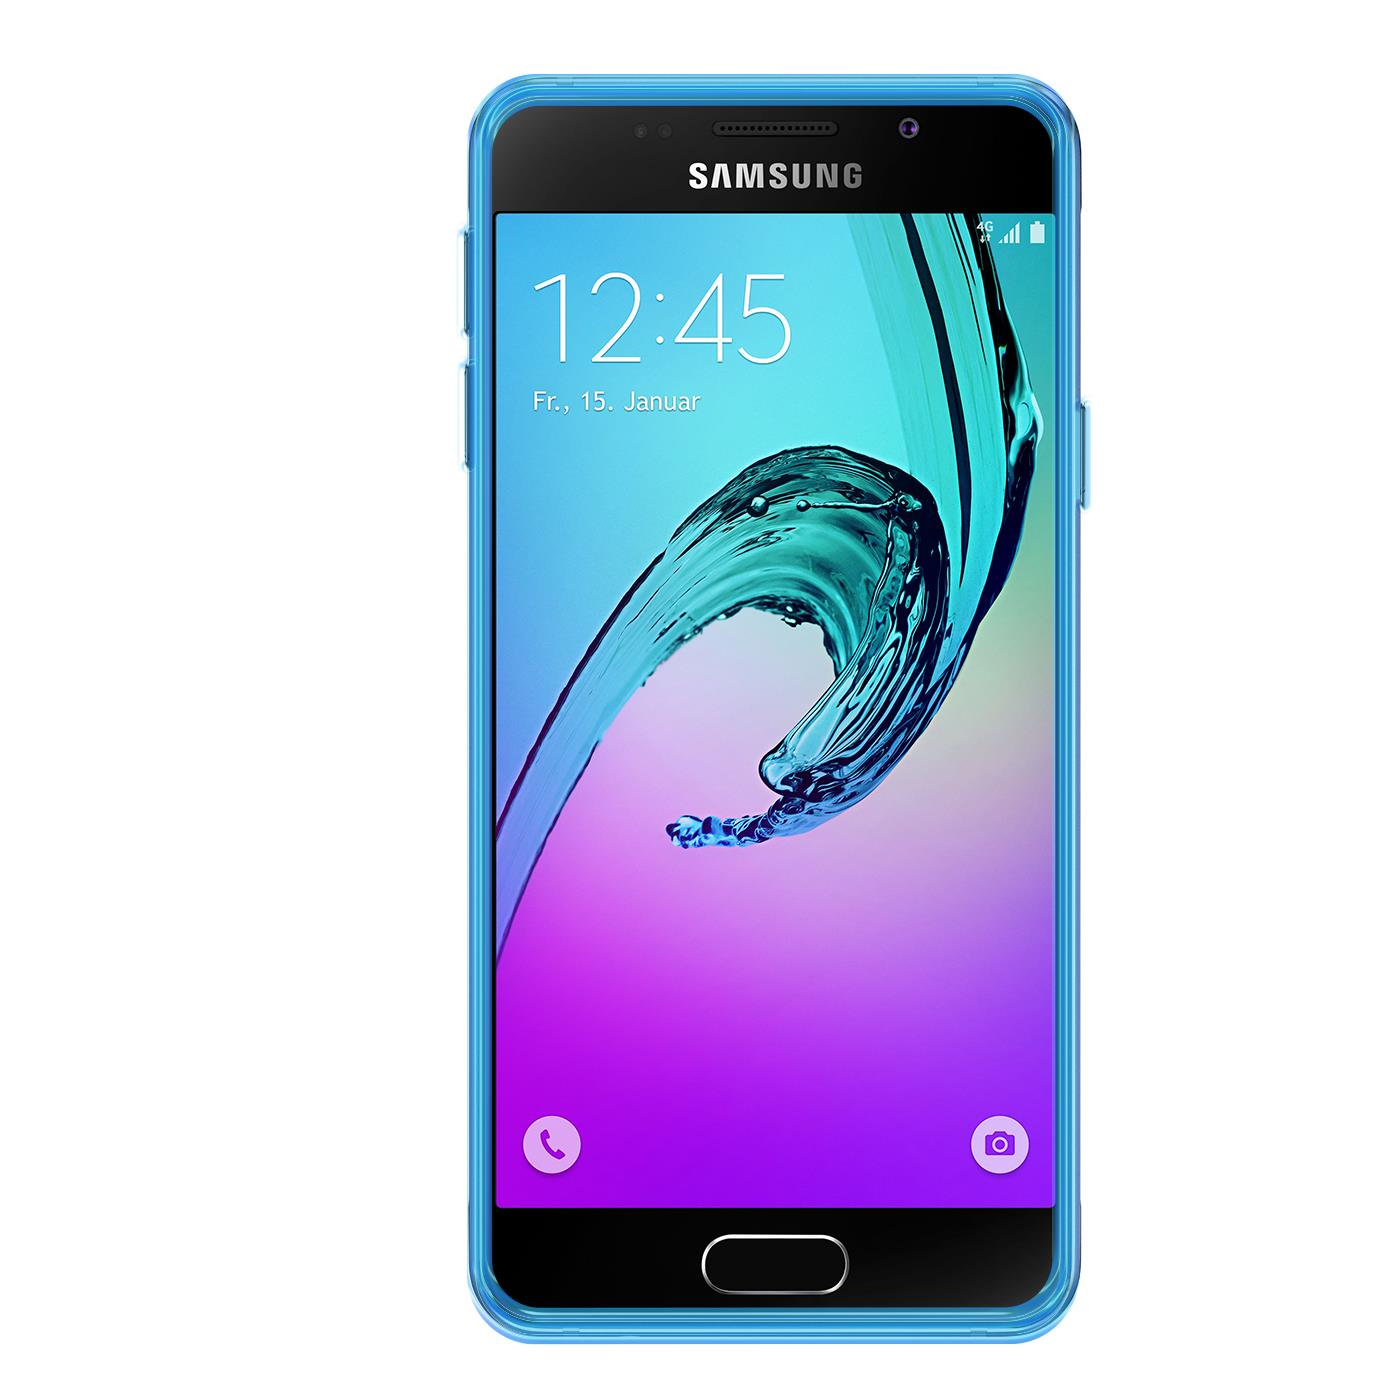 Samsung-Galaxy-a3-2016-Thin-Silikon-Klar-Case-Cover-Ultra-Slim-Stossfeste-Gel Indexbild 9